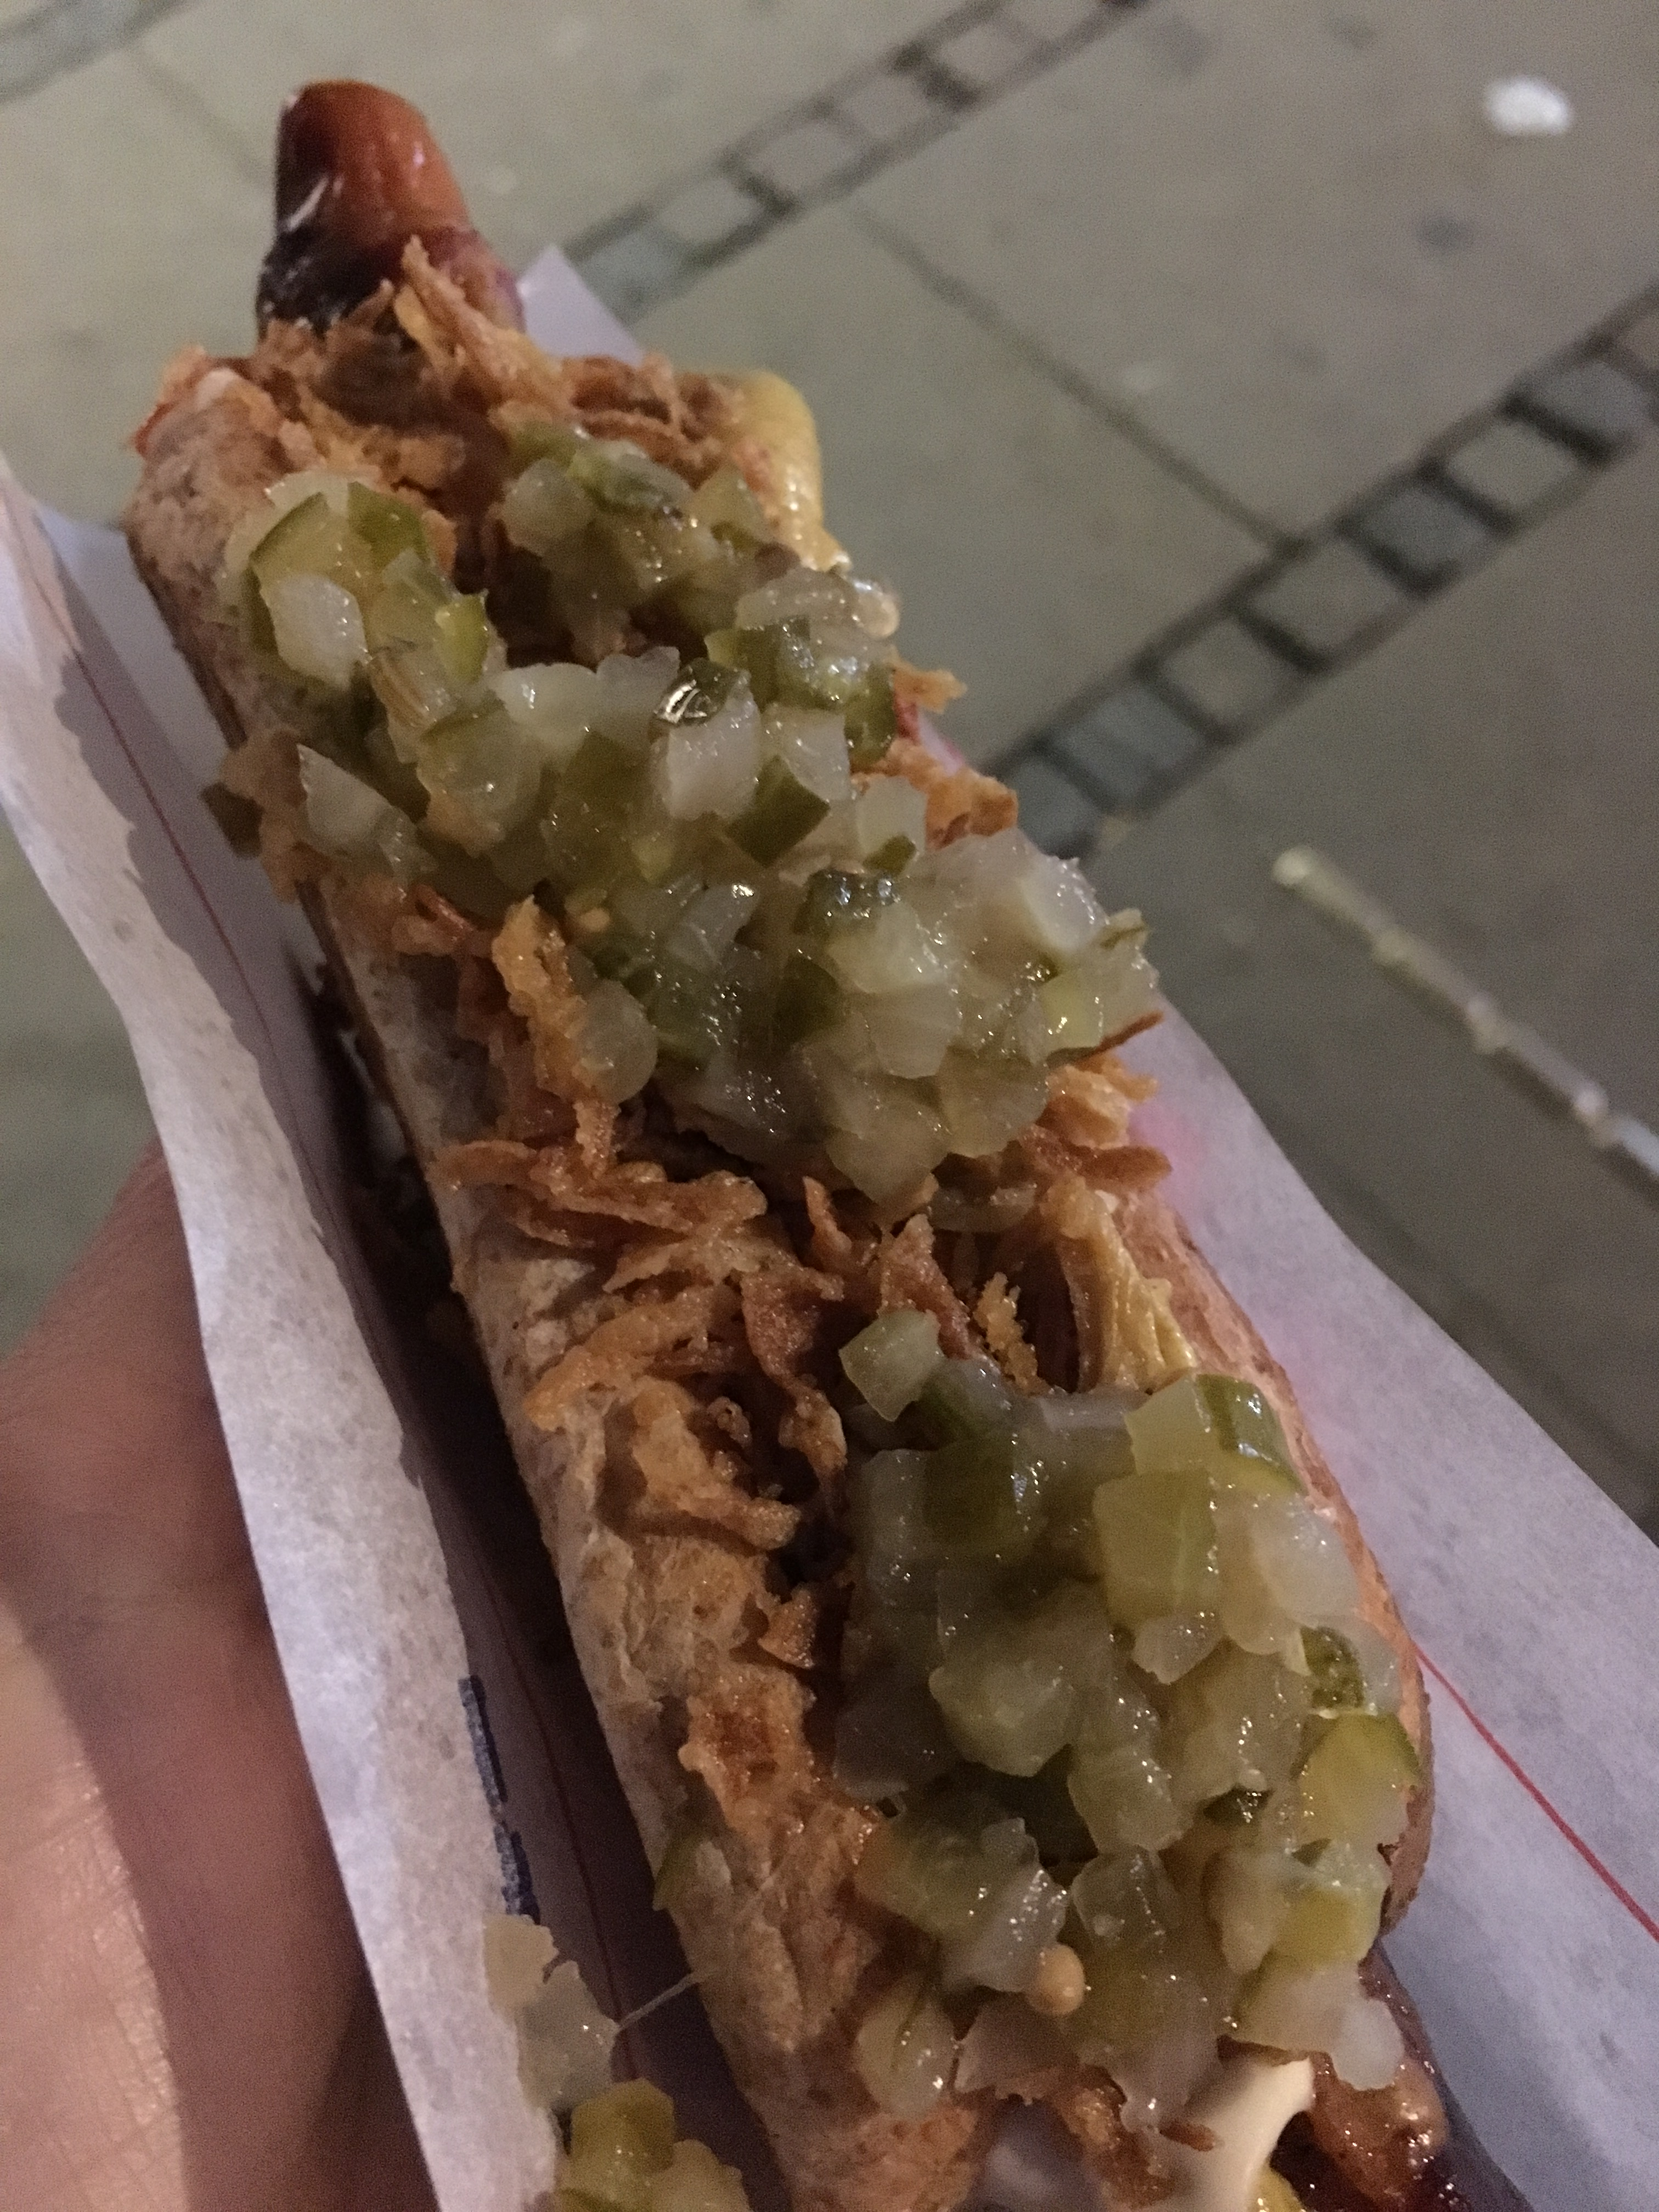 Hot Diggity Danish Dog – Johns Hotdog Deli in Copenhagen, Denmark